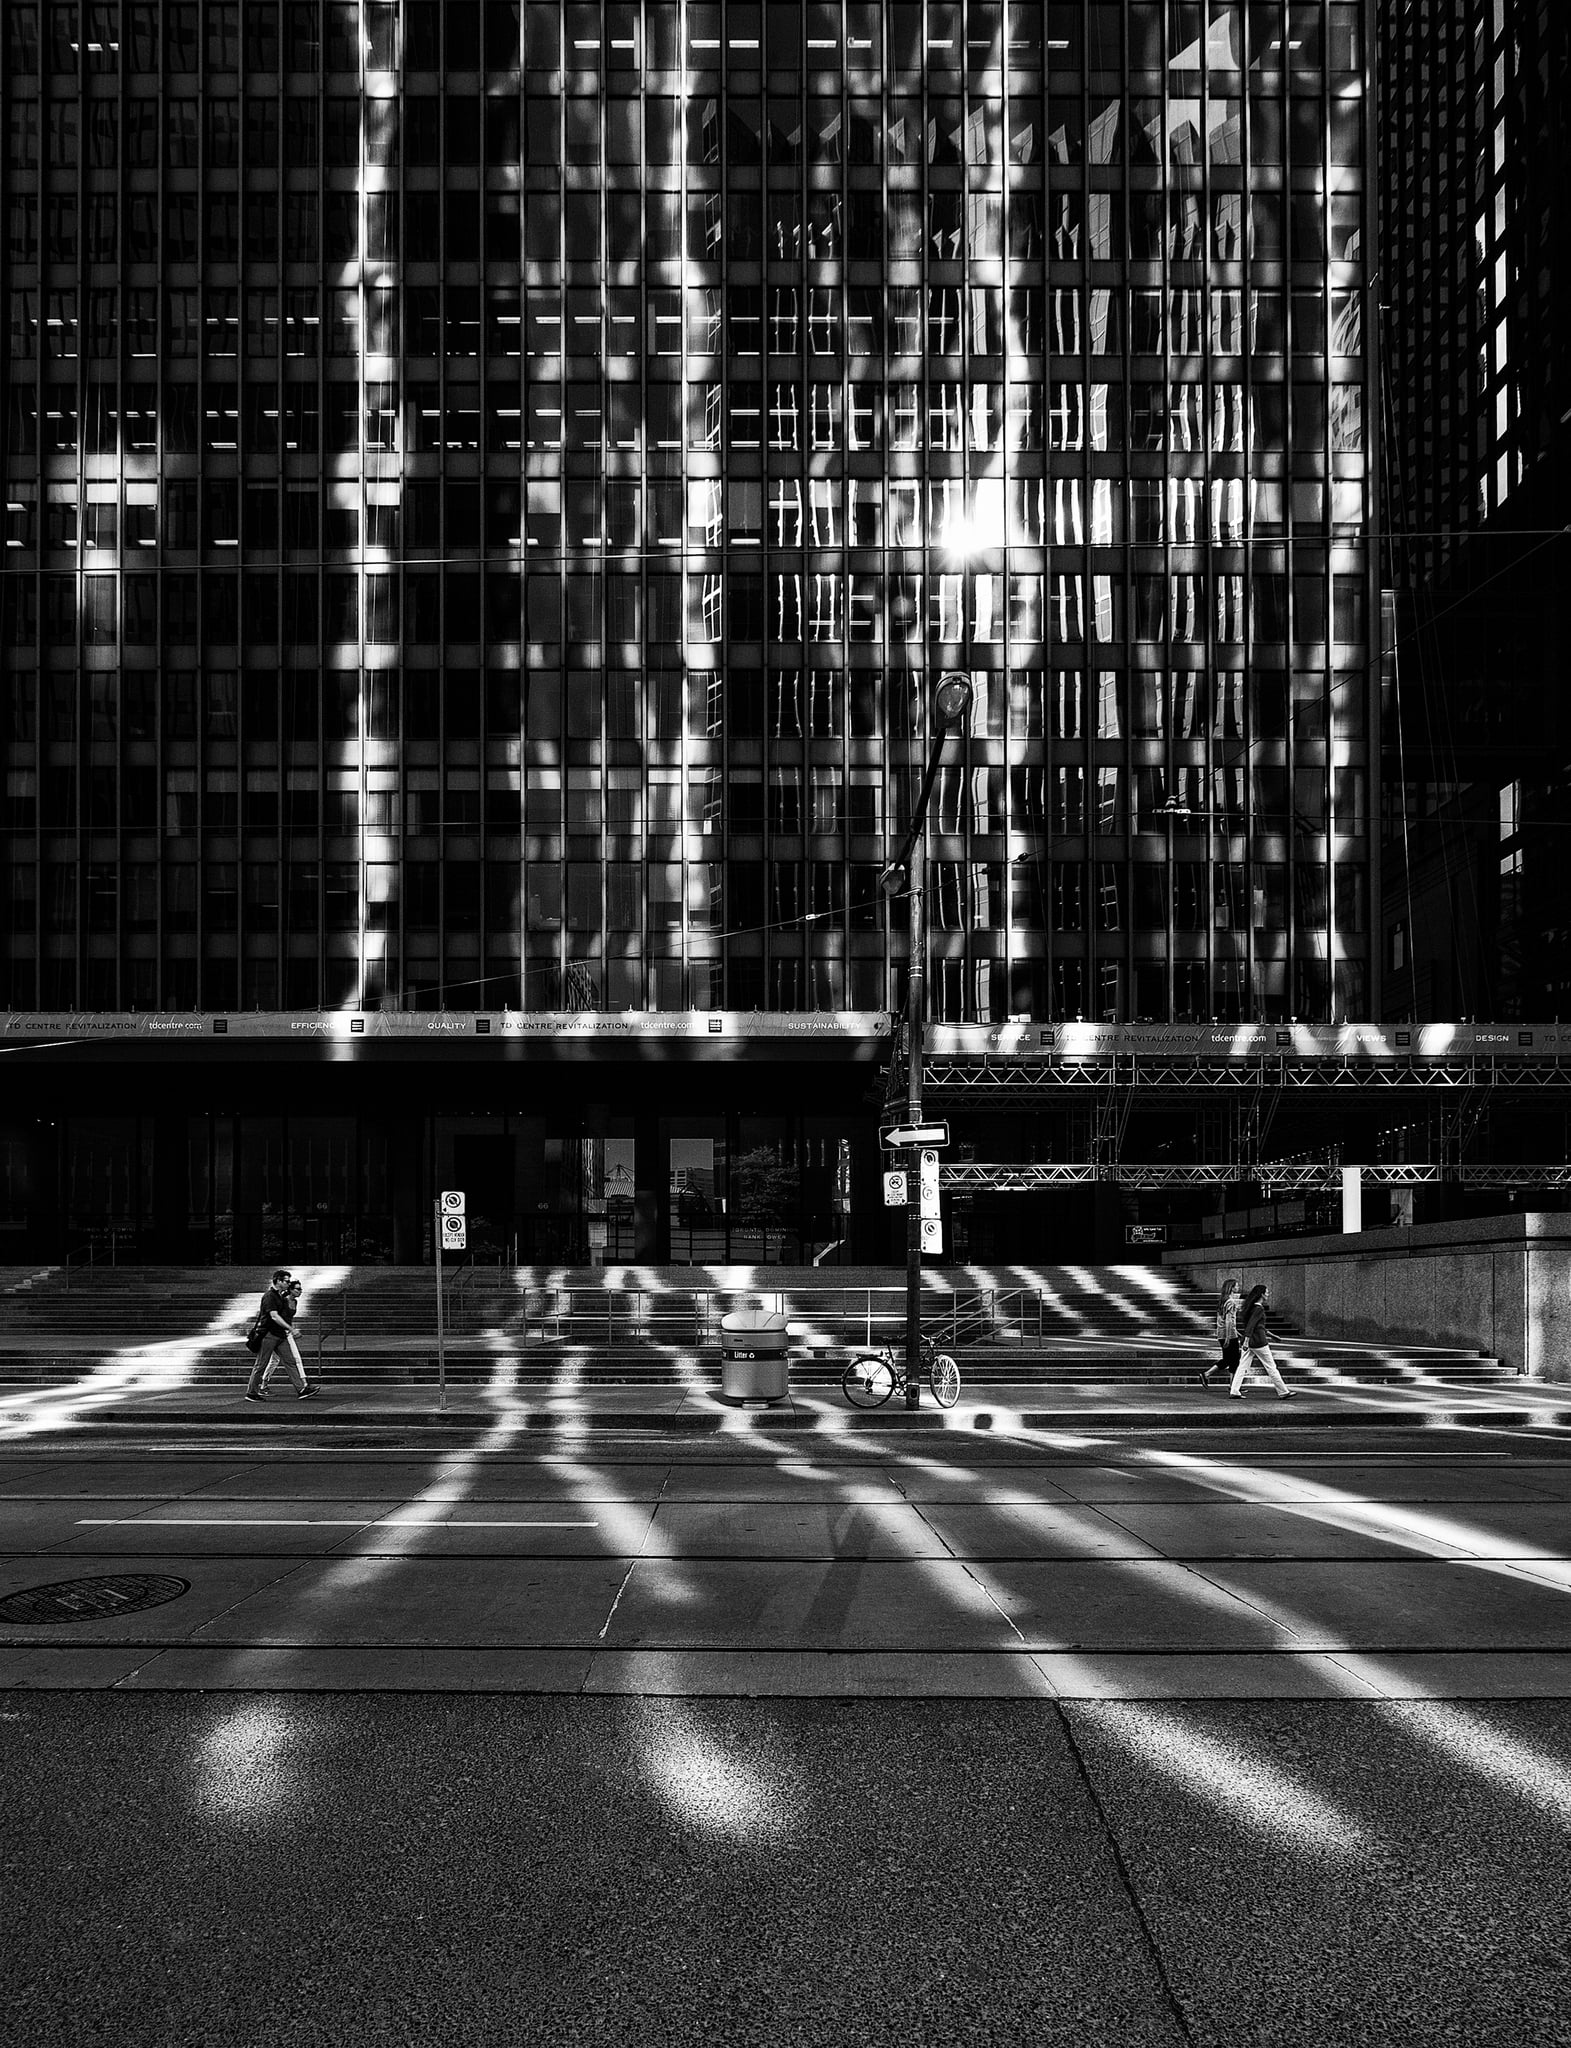 wellington-street_toronto-dominion-centre_reflection-lines_01bwc.jpg